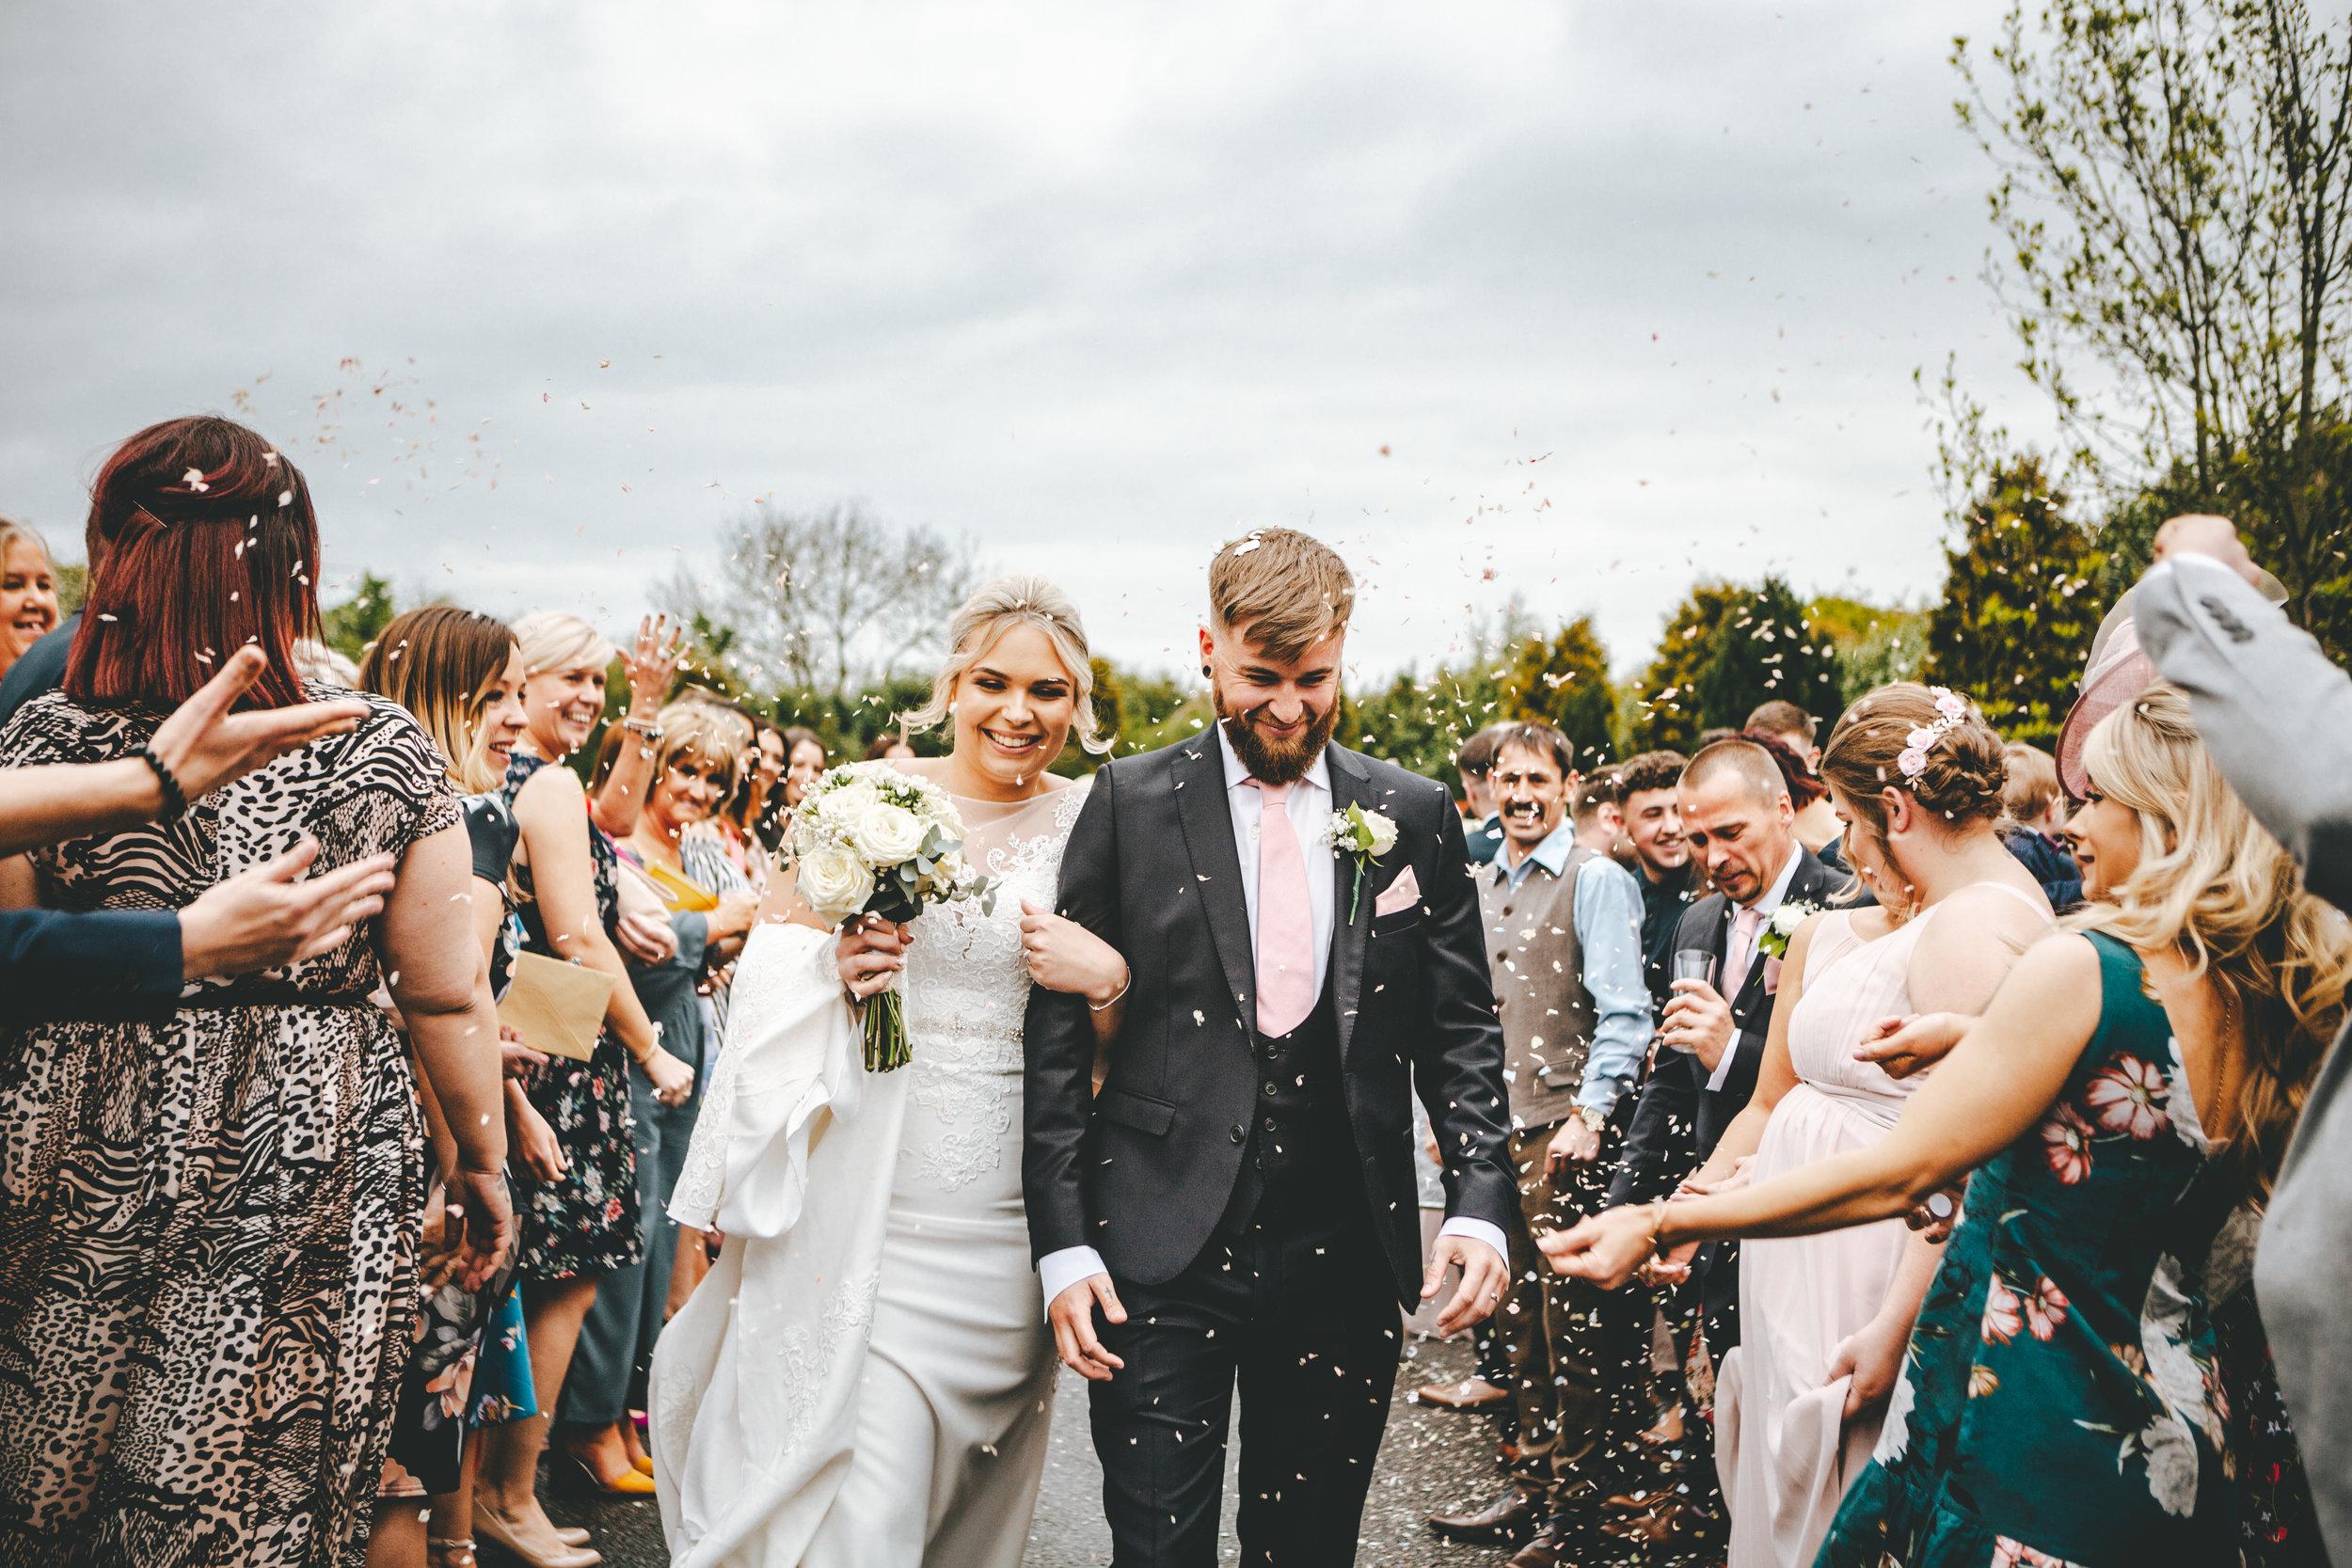 Confetti, Wedding, Bride, Groom, Love, Yorkshire Wedding, Wedding Photographer